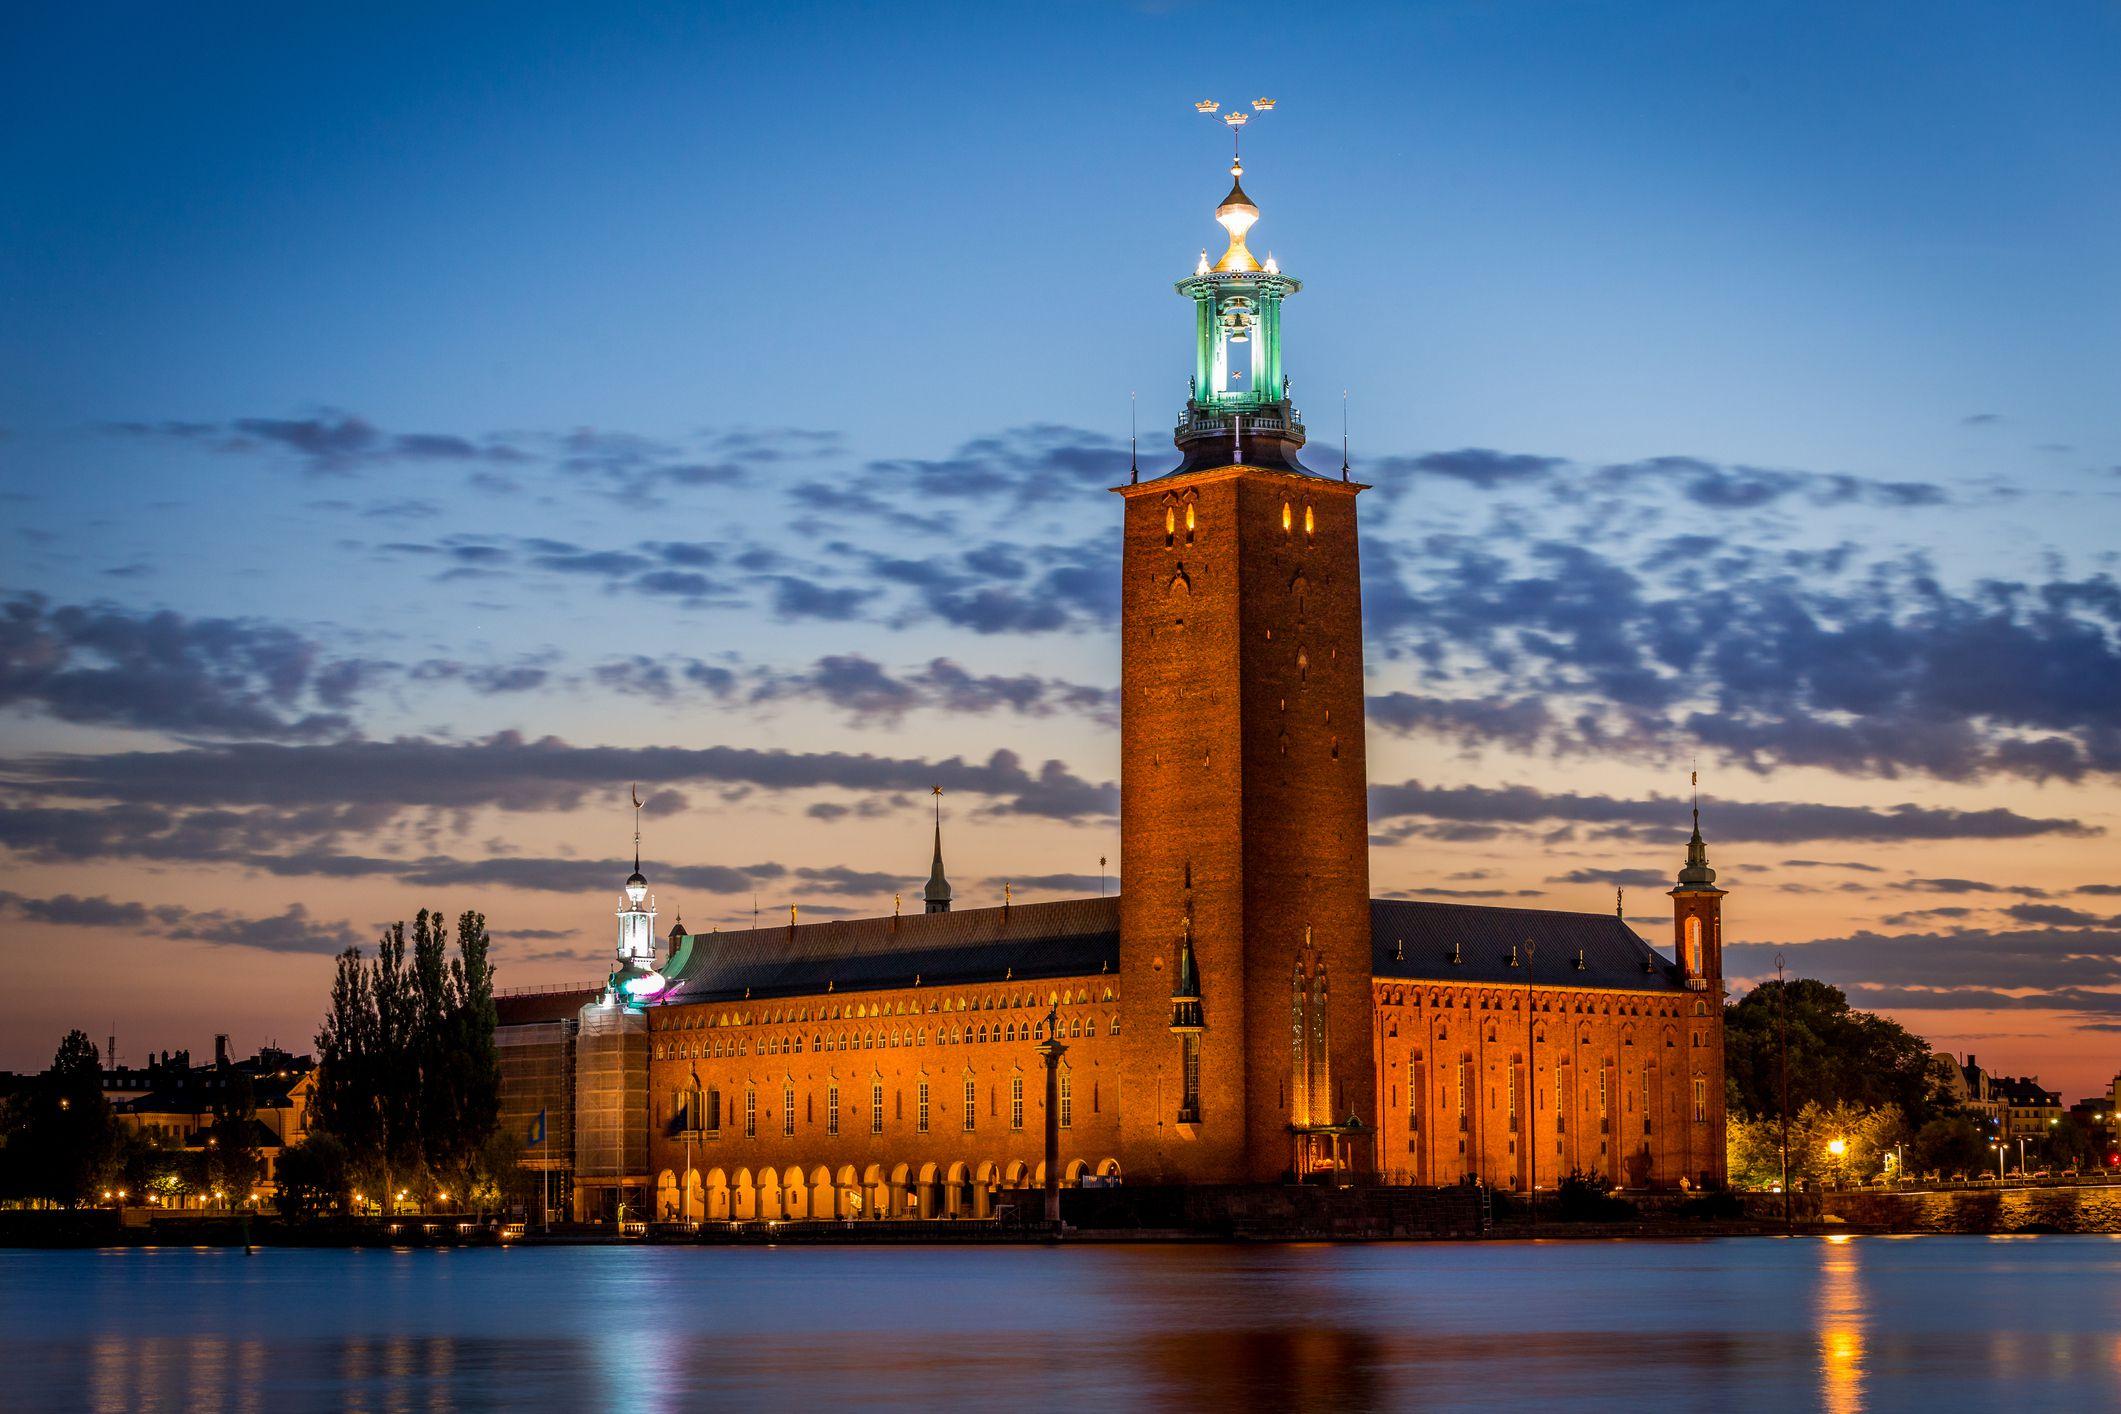 Stadshus - Stockholm Town Hall